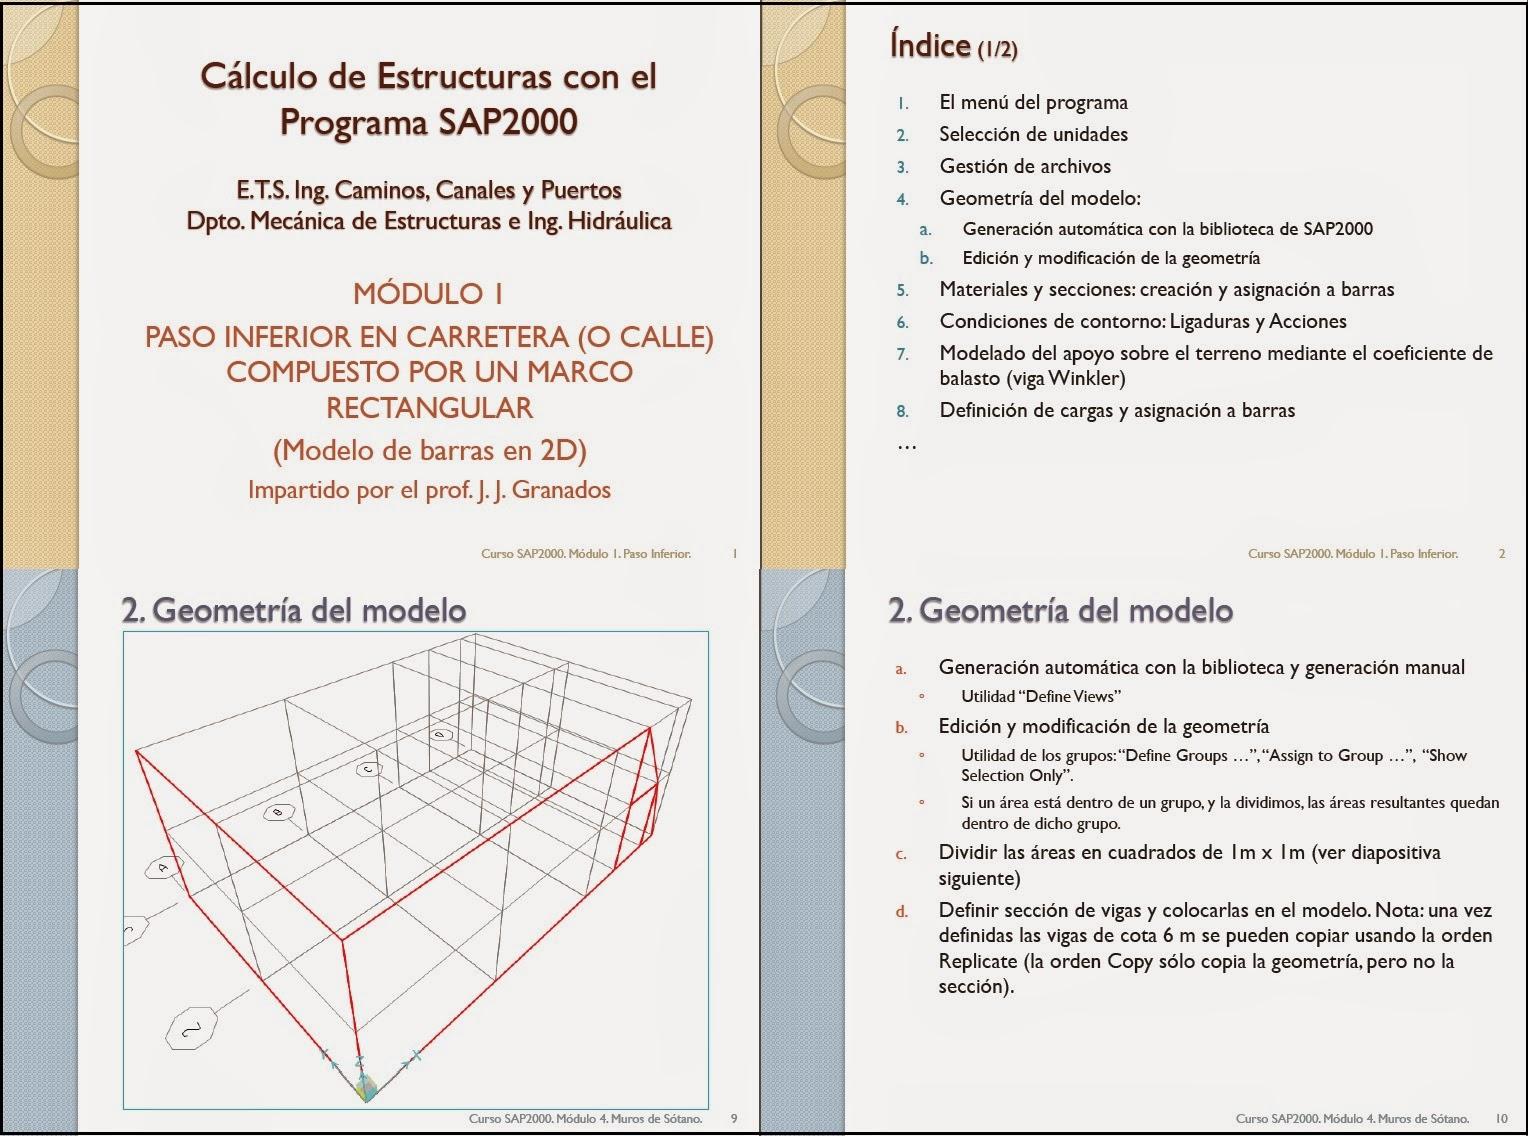 Calculo de estructuras sap2000